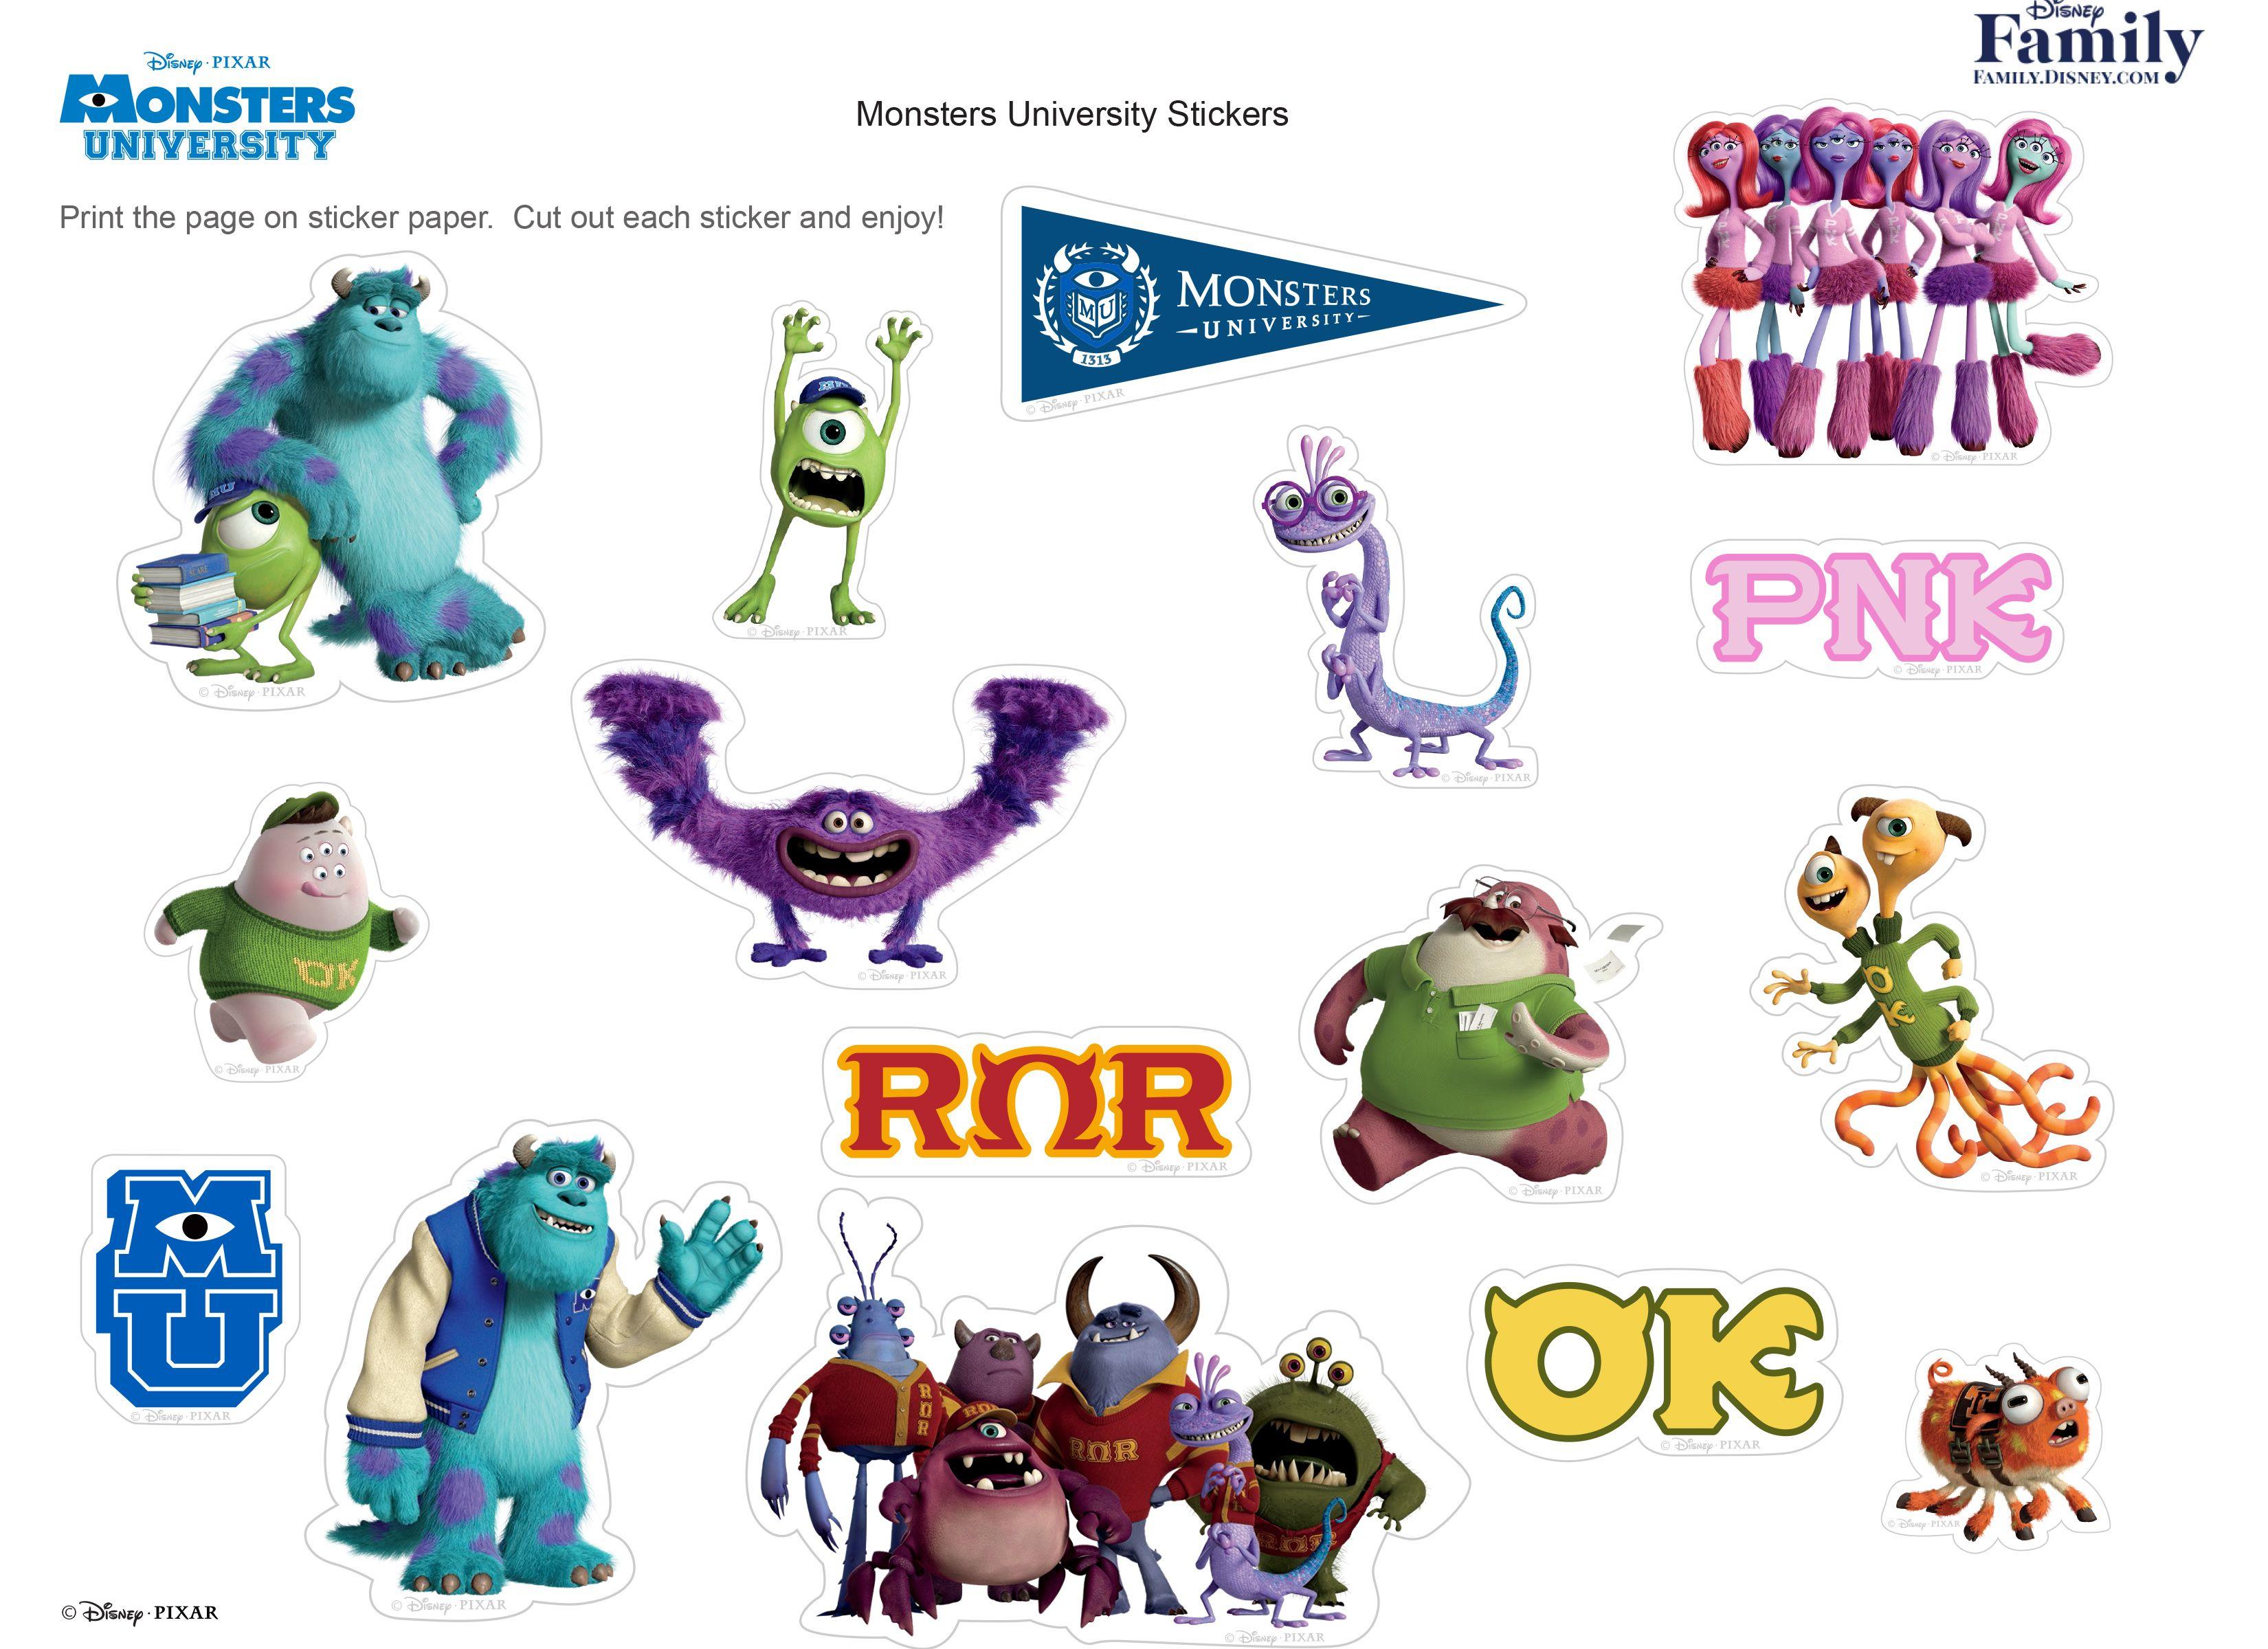 Monsters University Stickers